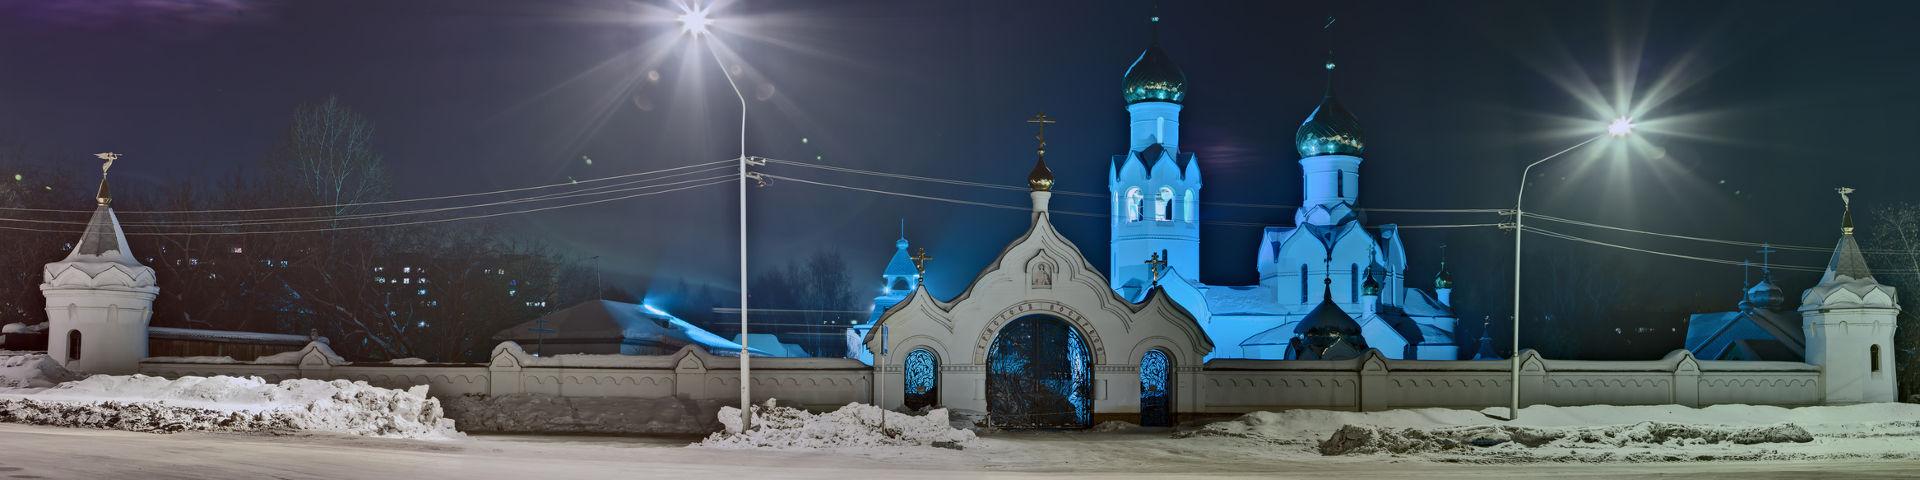 Novosibirsk hero2